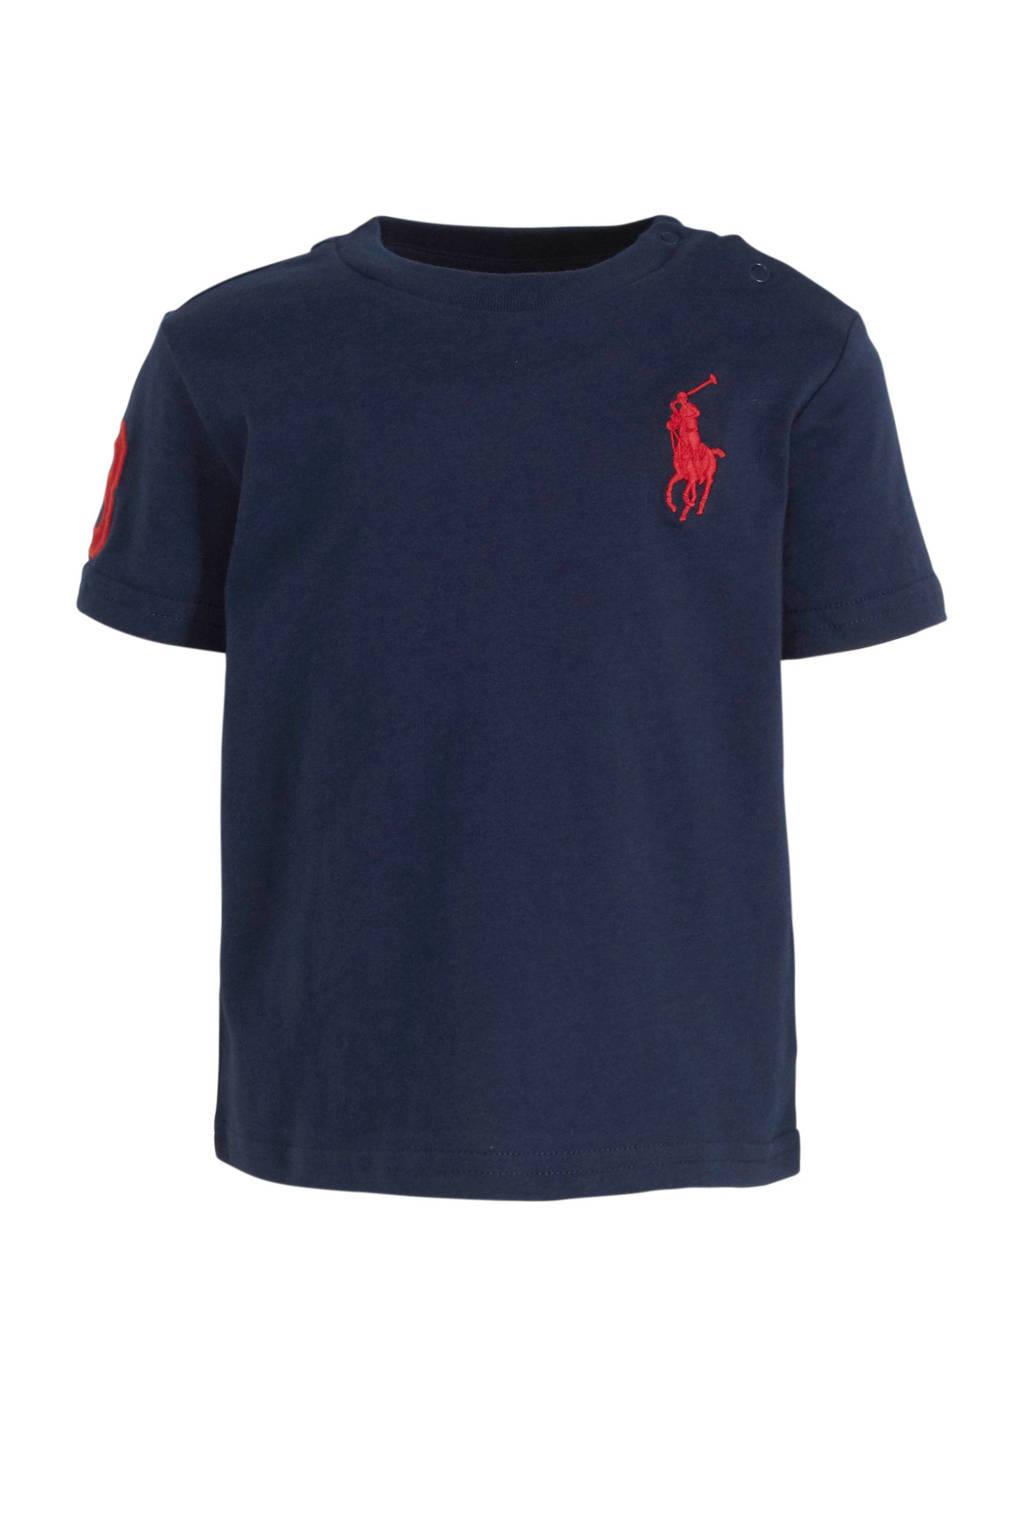 POLO Ralph Lauren baby T-shirt met logo en borduursels donkerblauw/rood, Donkerblauw/rood